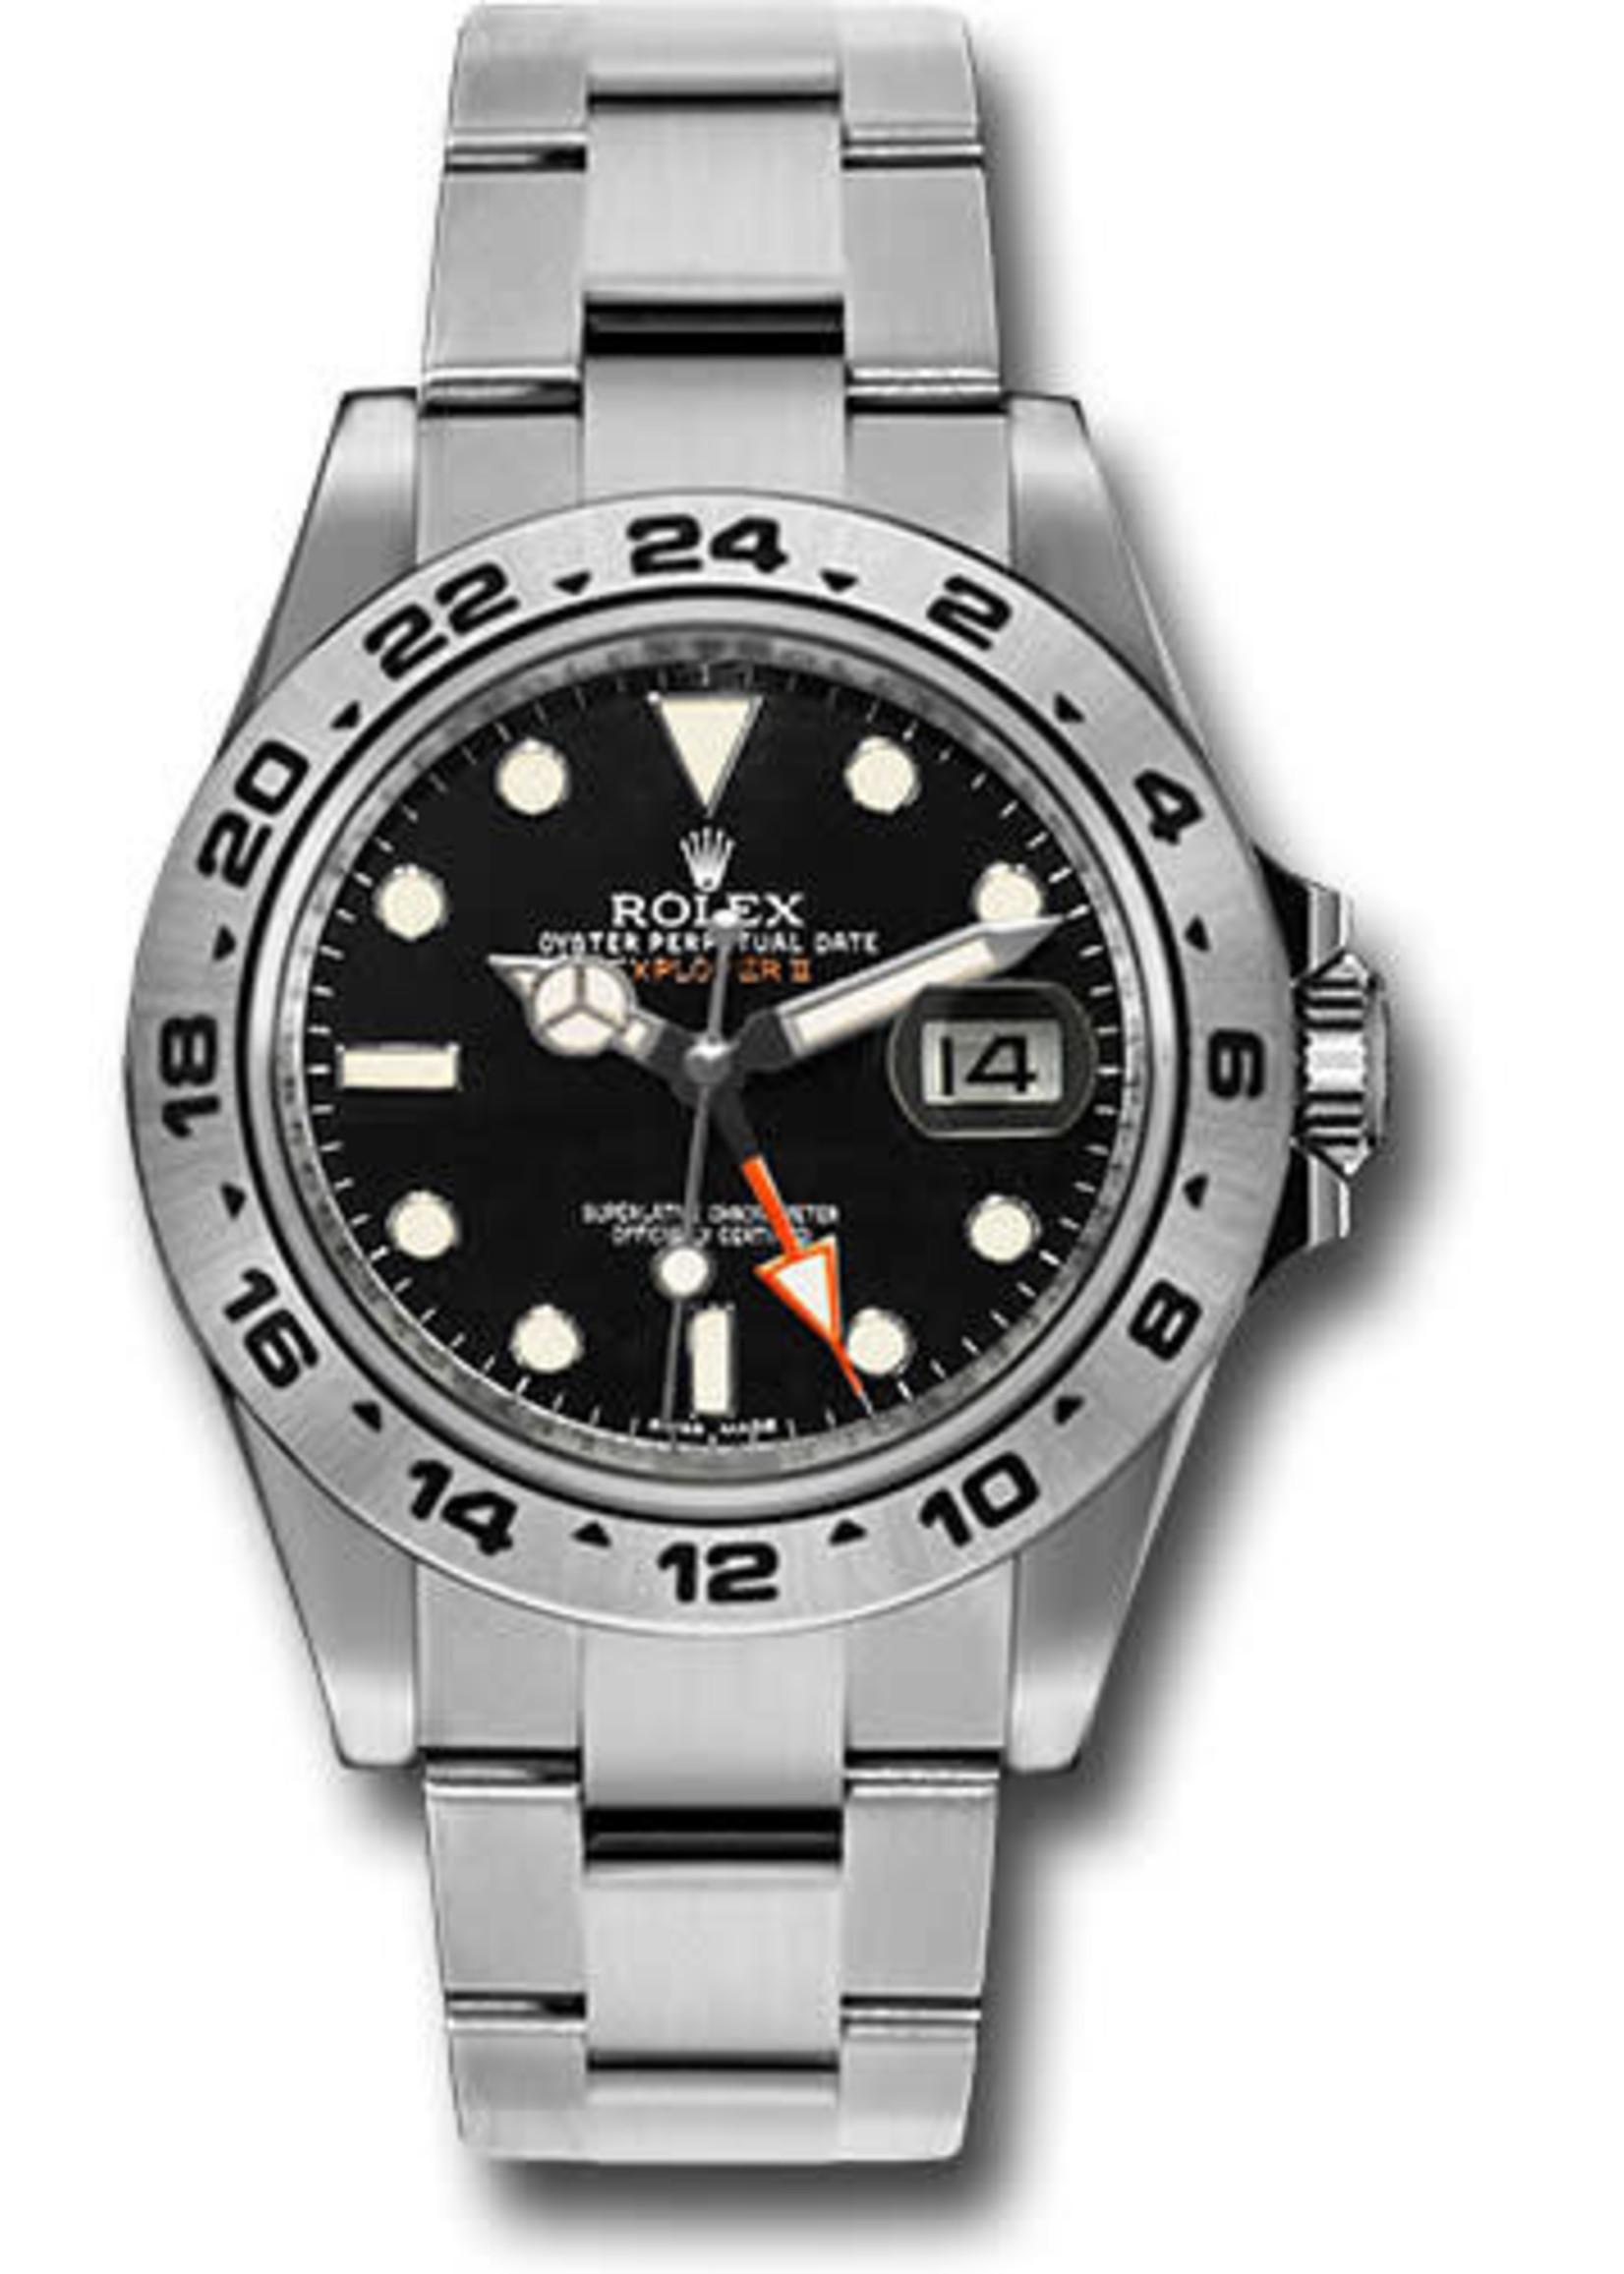 Rolex Rolex Explorer II 42MM #216570 (2013 B+P)